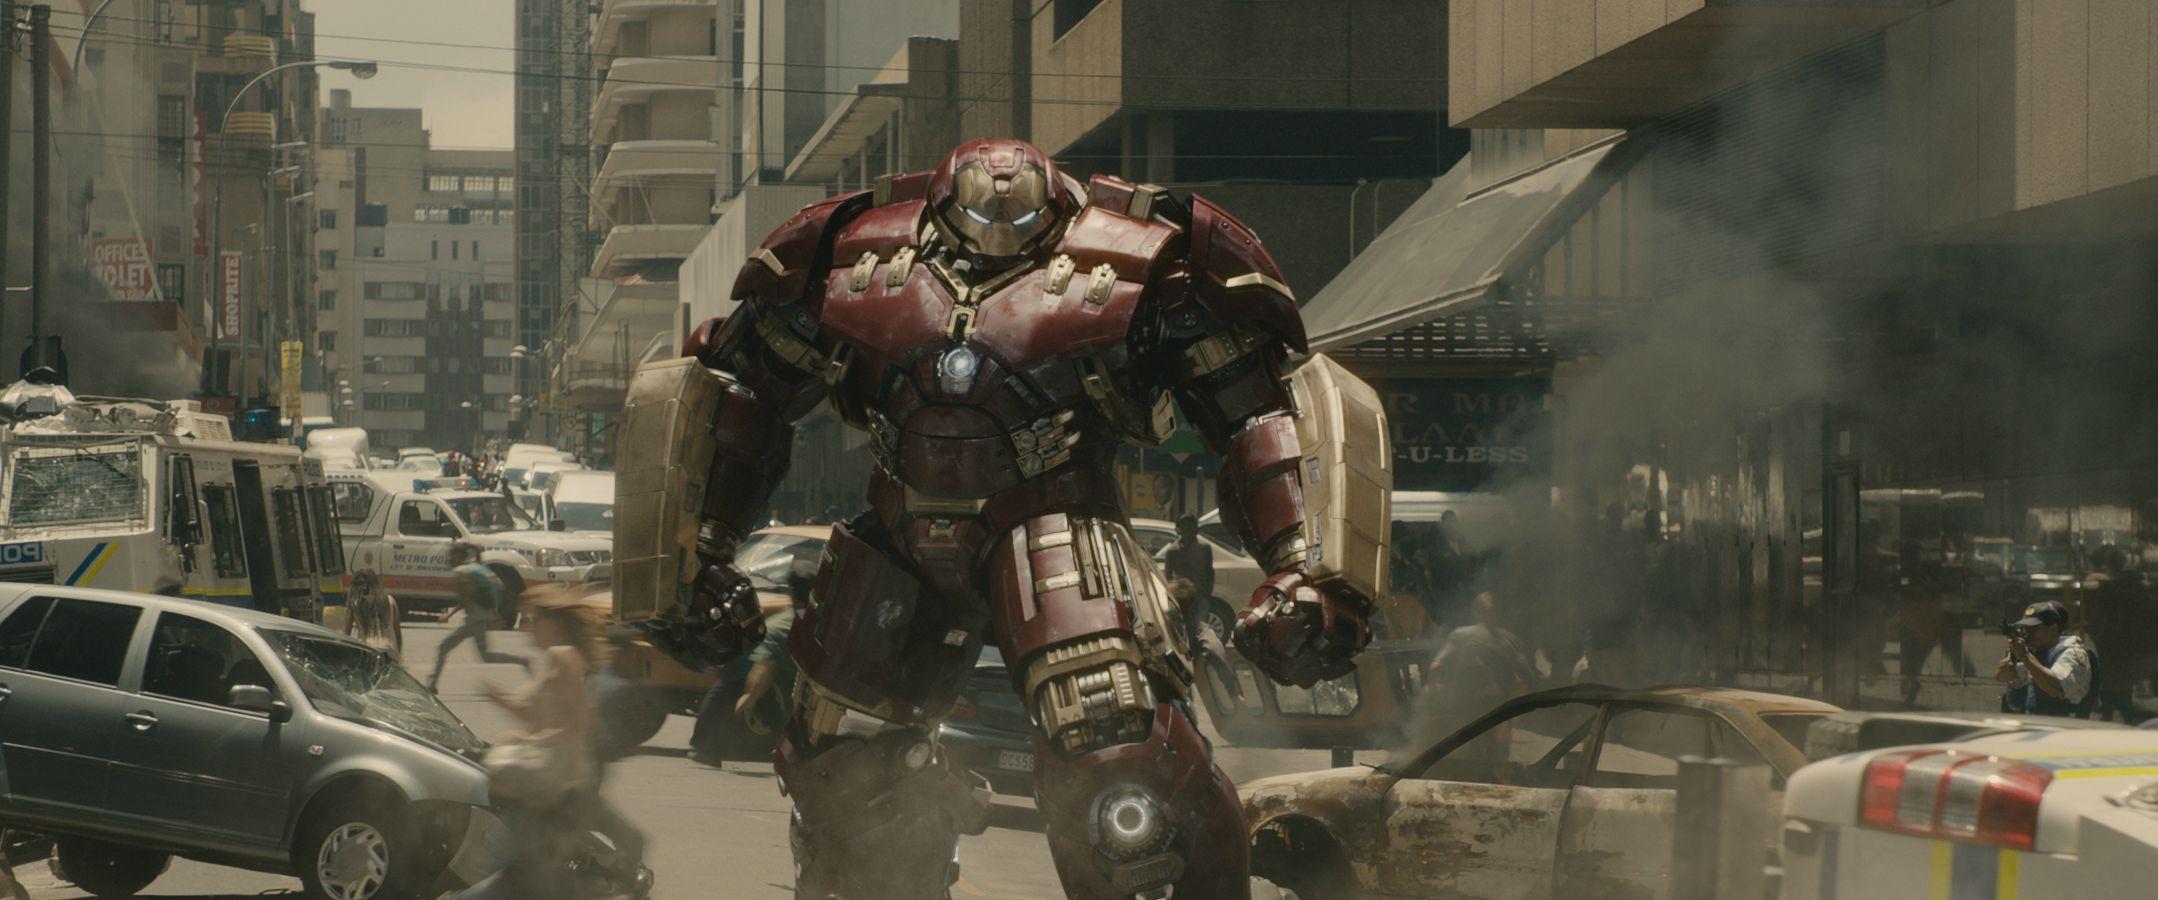 Hulk Buster – Ready To Bust.jpg